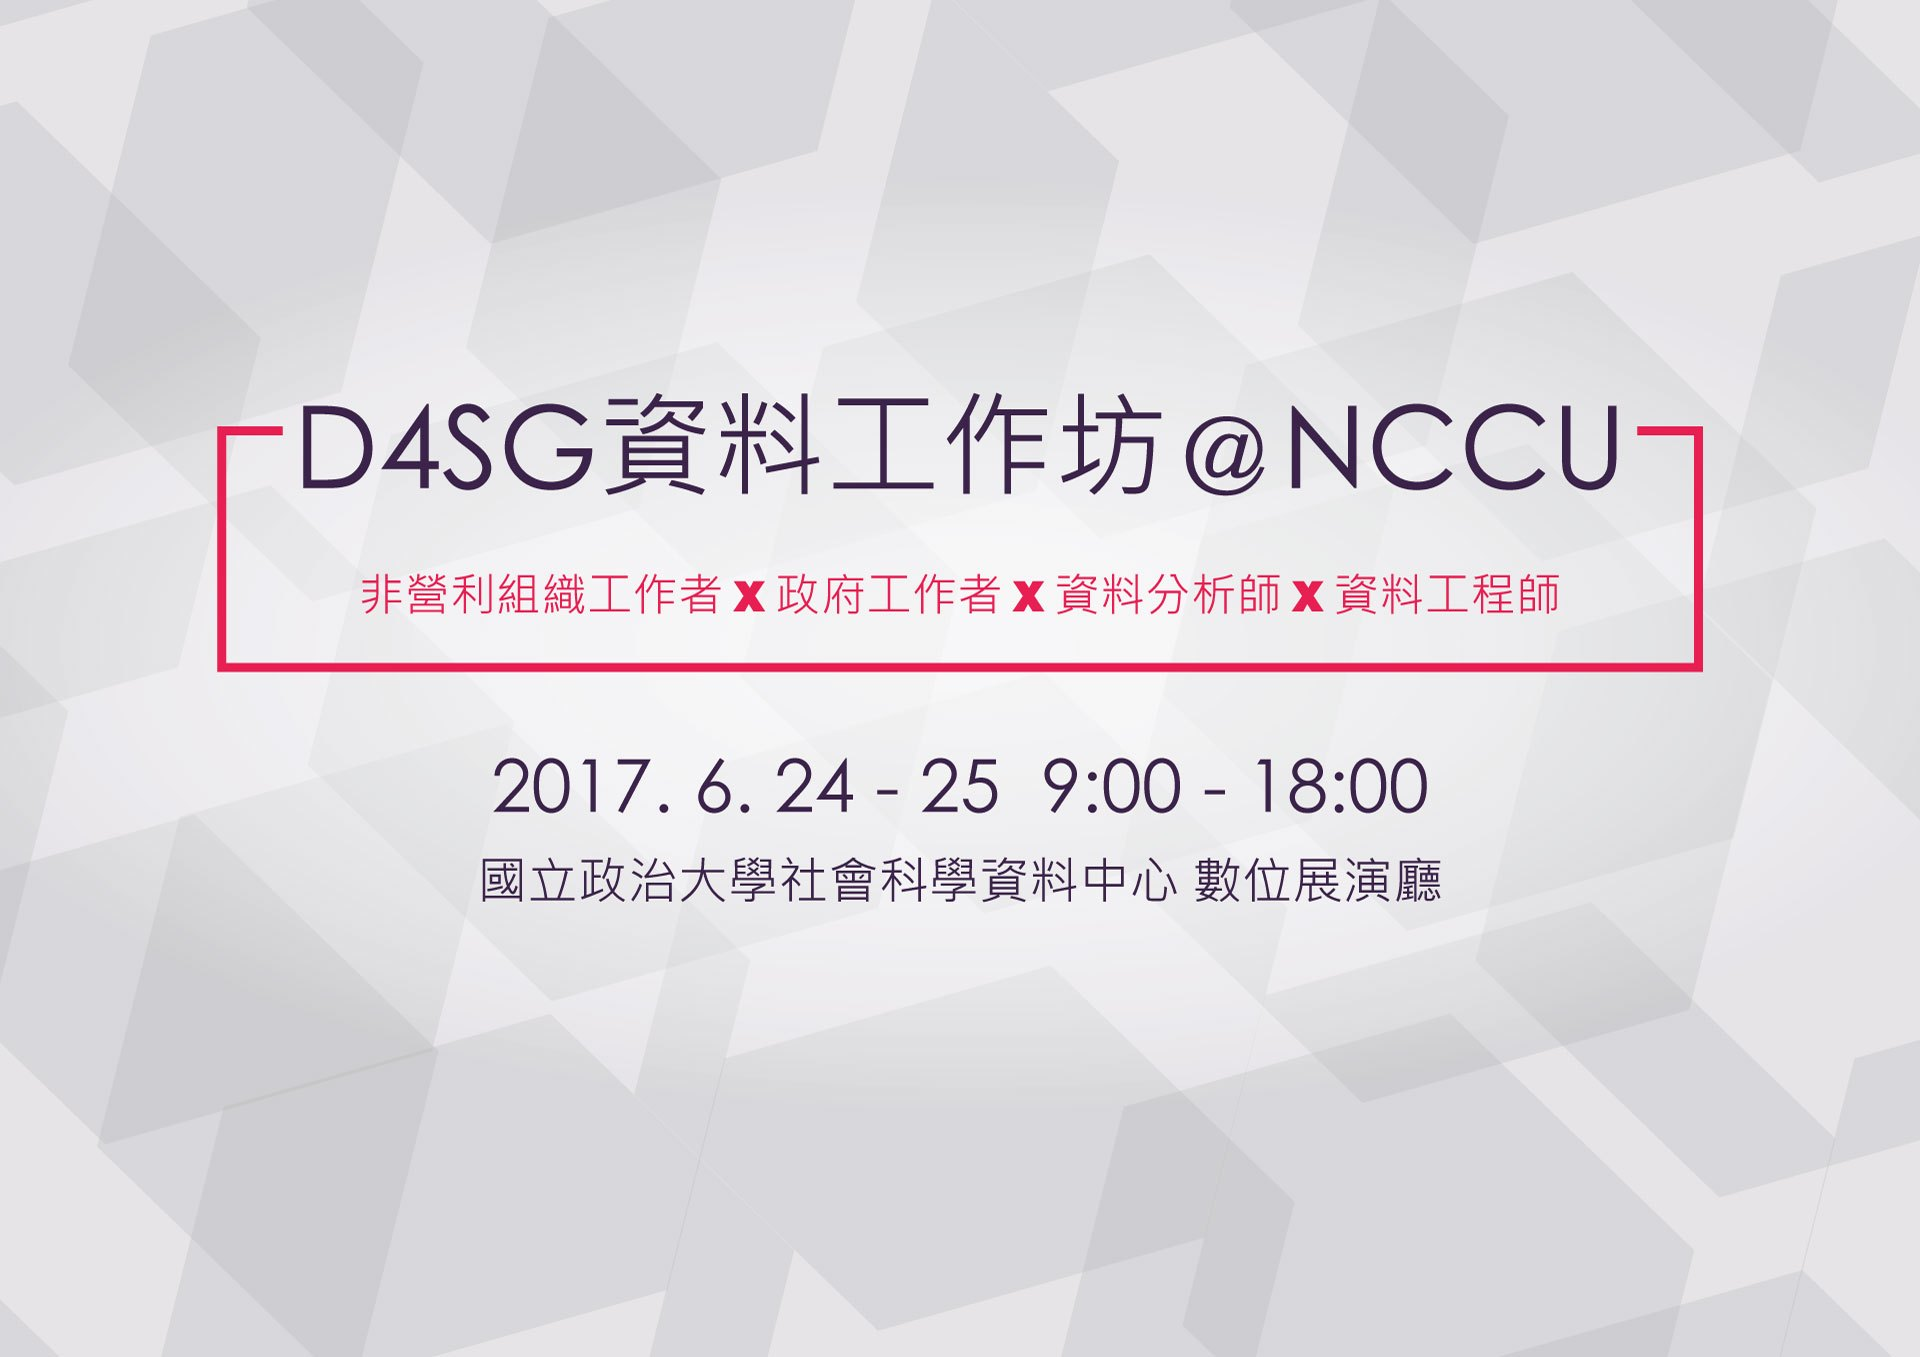 6/24-25 D4SG 資料工作坊@NCCU